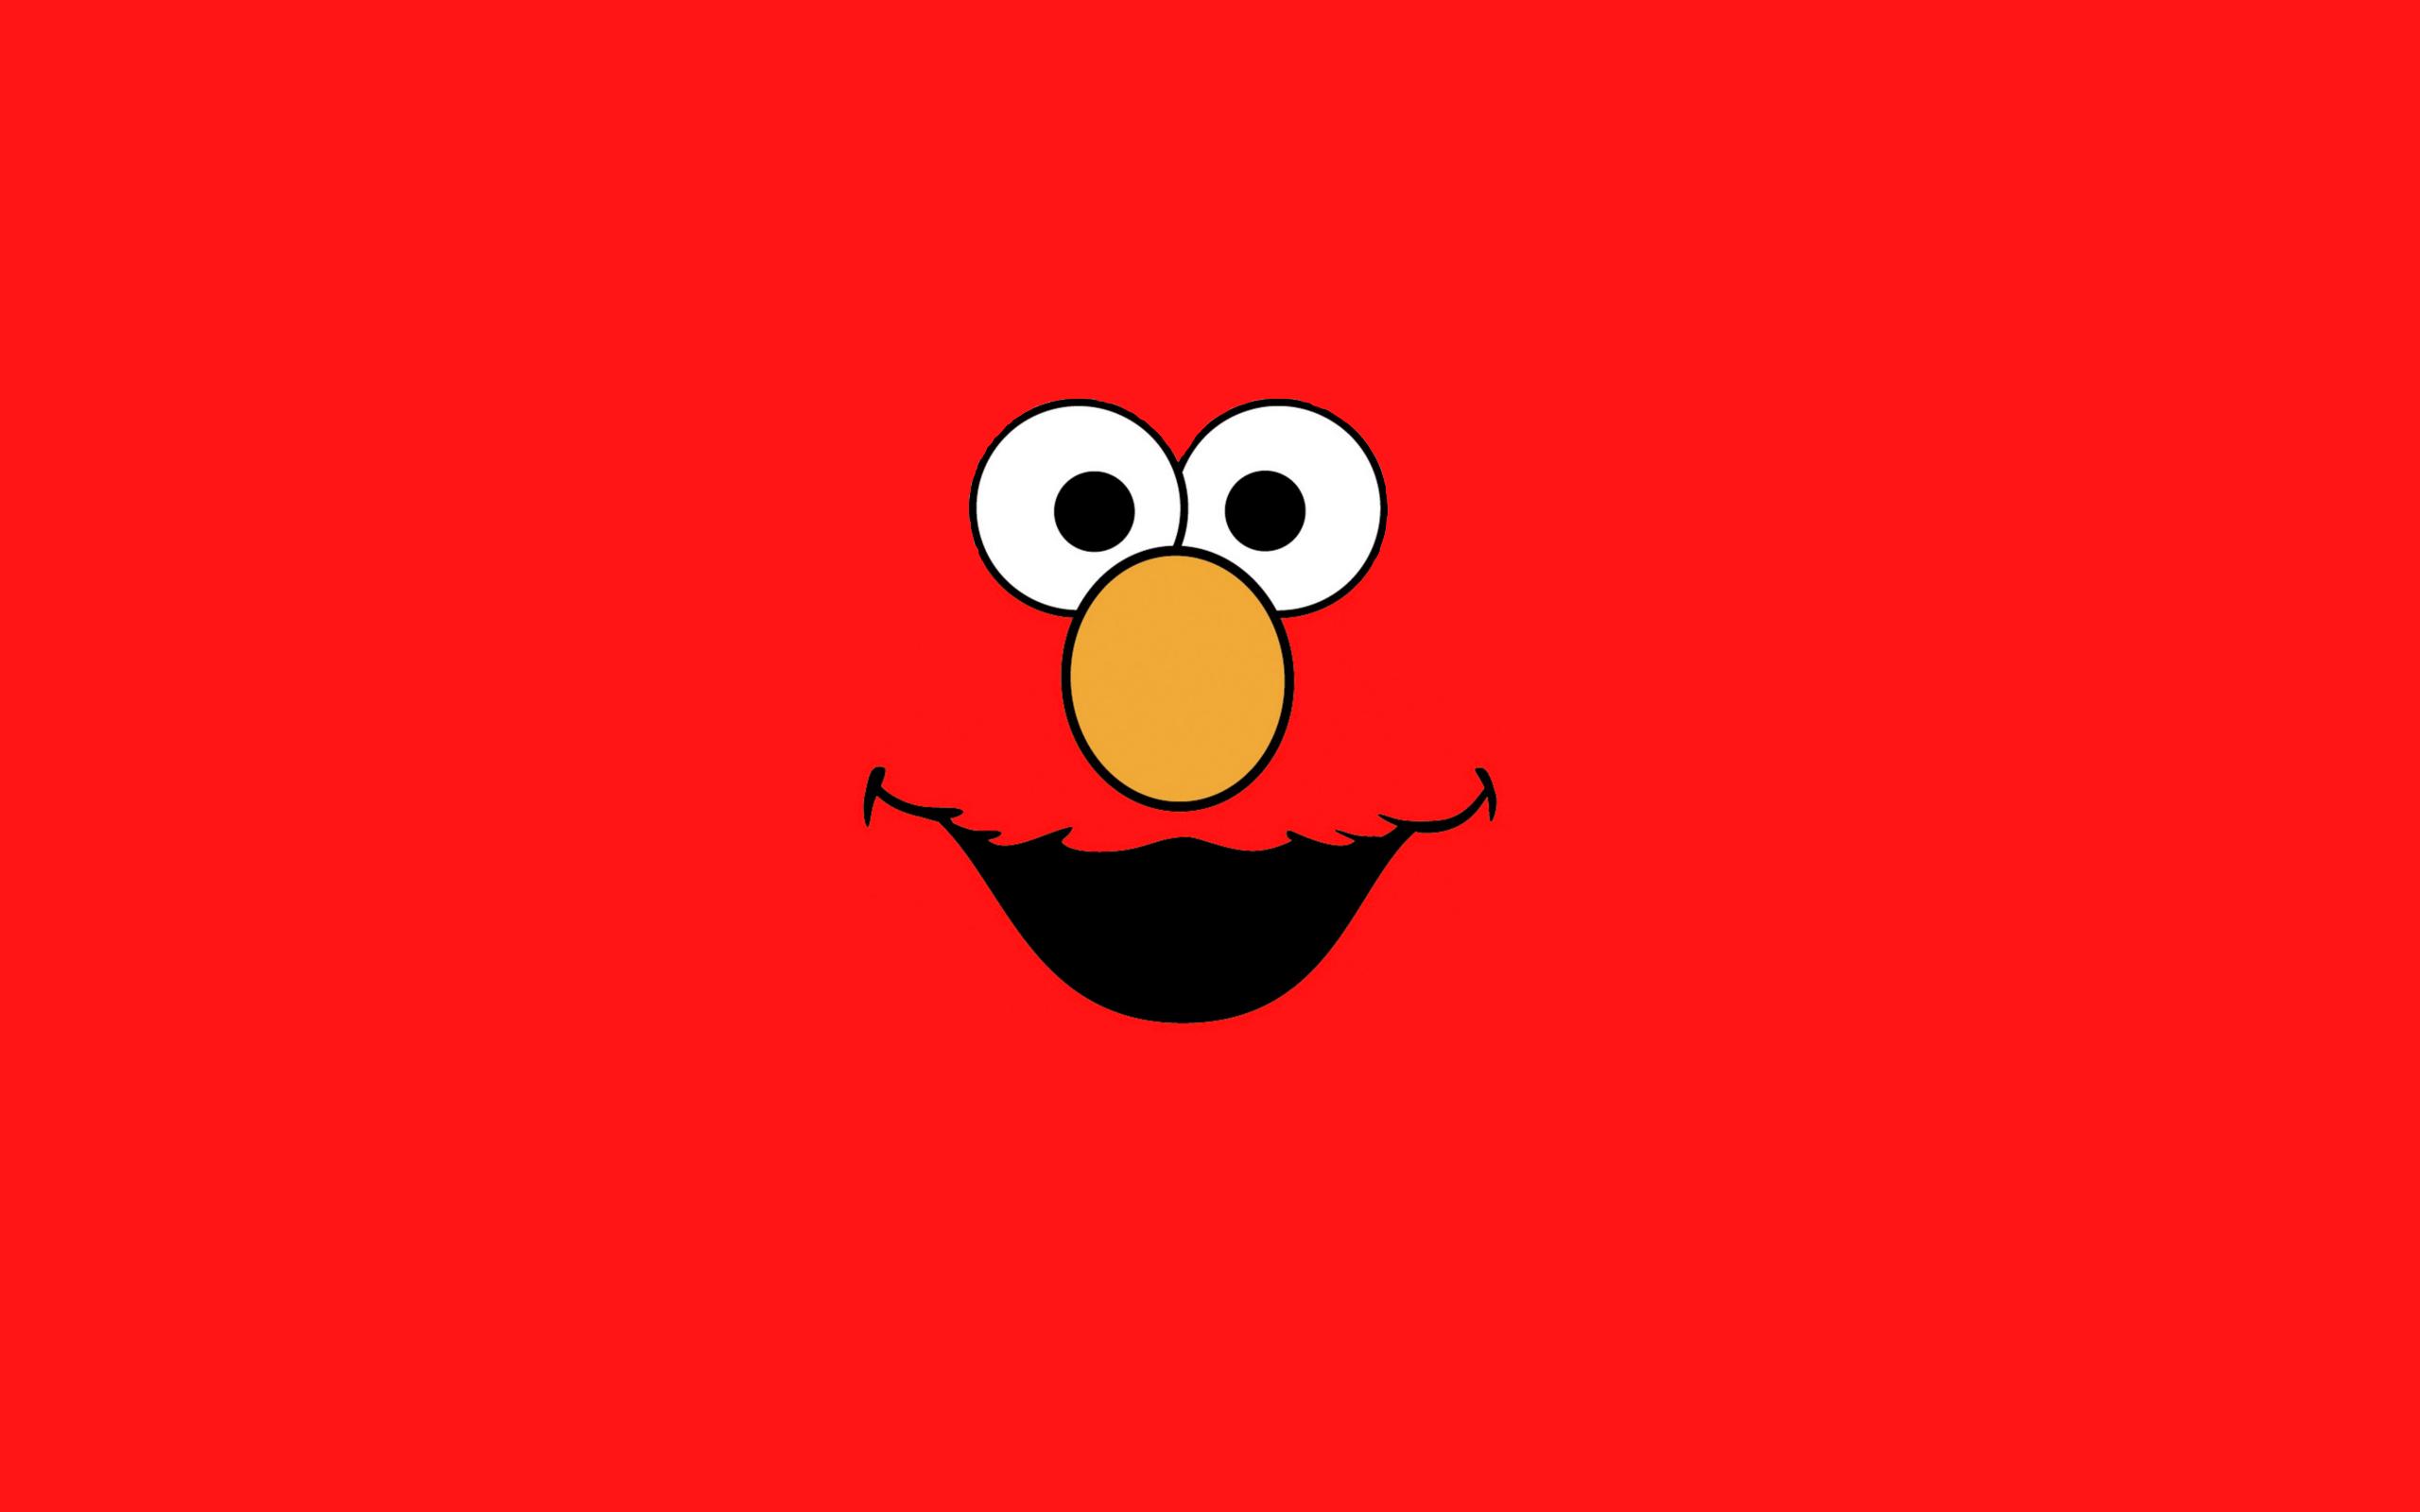 Illustration Minimalism Logo Cartoon Sesame Street Elmo 2560x1600 Px